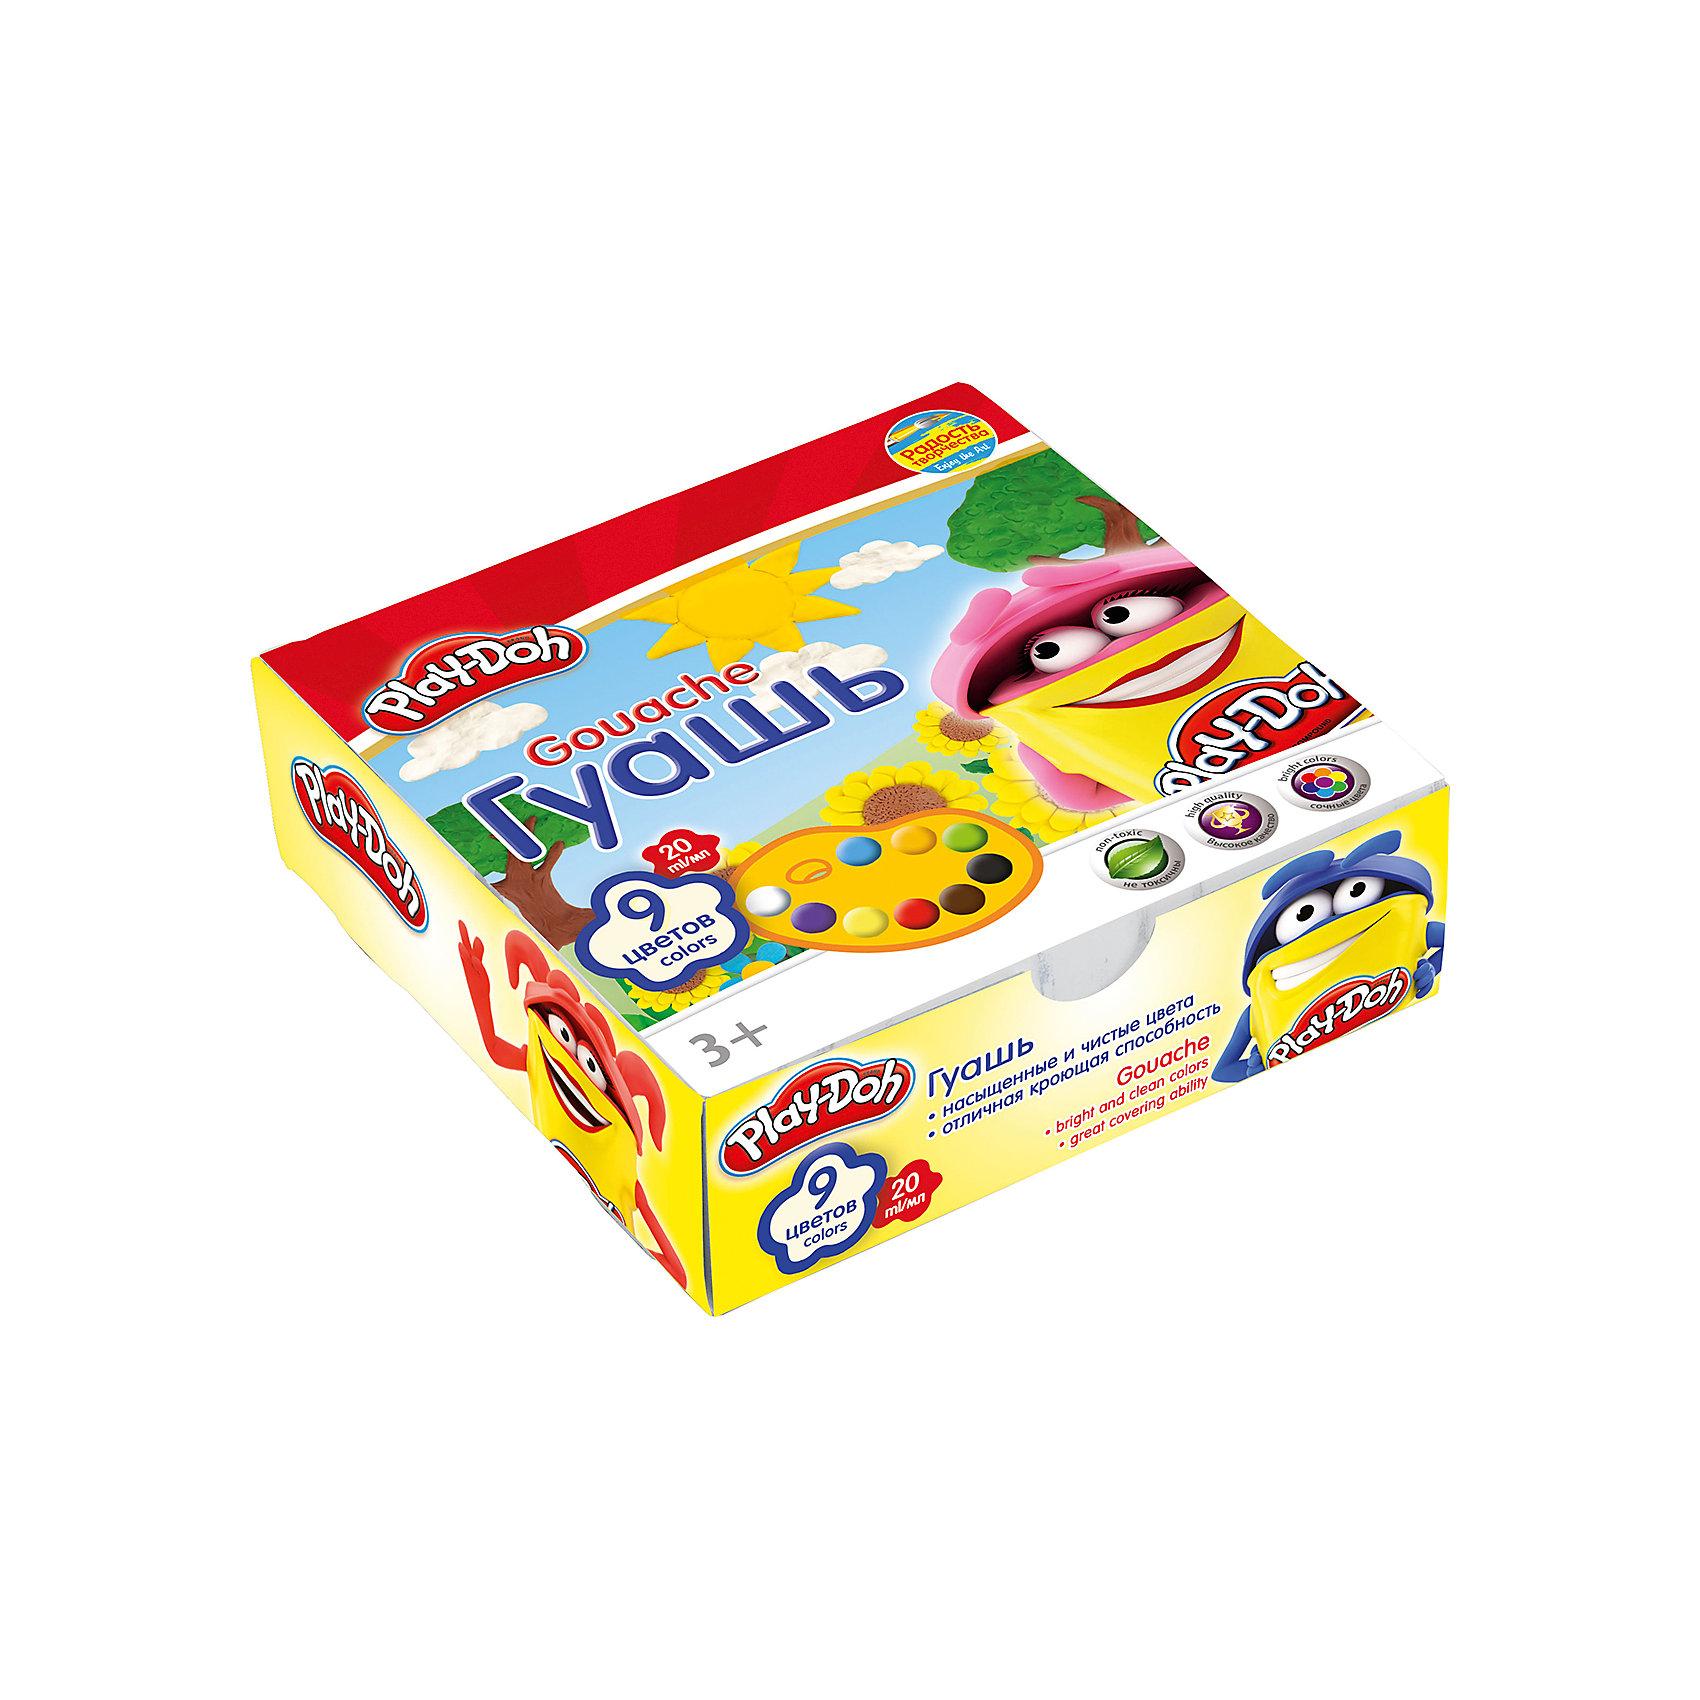 Гуашь 9 цветов, Play-DohКраски гуашевые 9 цв. Объем краски одного цвета 20 мл. Упаковка ? картонная коробка. Размер 12 х 12 х 3,8 см.Play Doh<br><br>Ширина мм: 120<br>Глубина мм: 120<br>Высота мм: 38<br>Вес г: 345<br>Возраст от месяцев: 36<br>Возраст до месяцев: 108<br>Пол: Унисекс<br>Возраст: Детский<br>SKU: 4614760